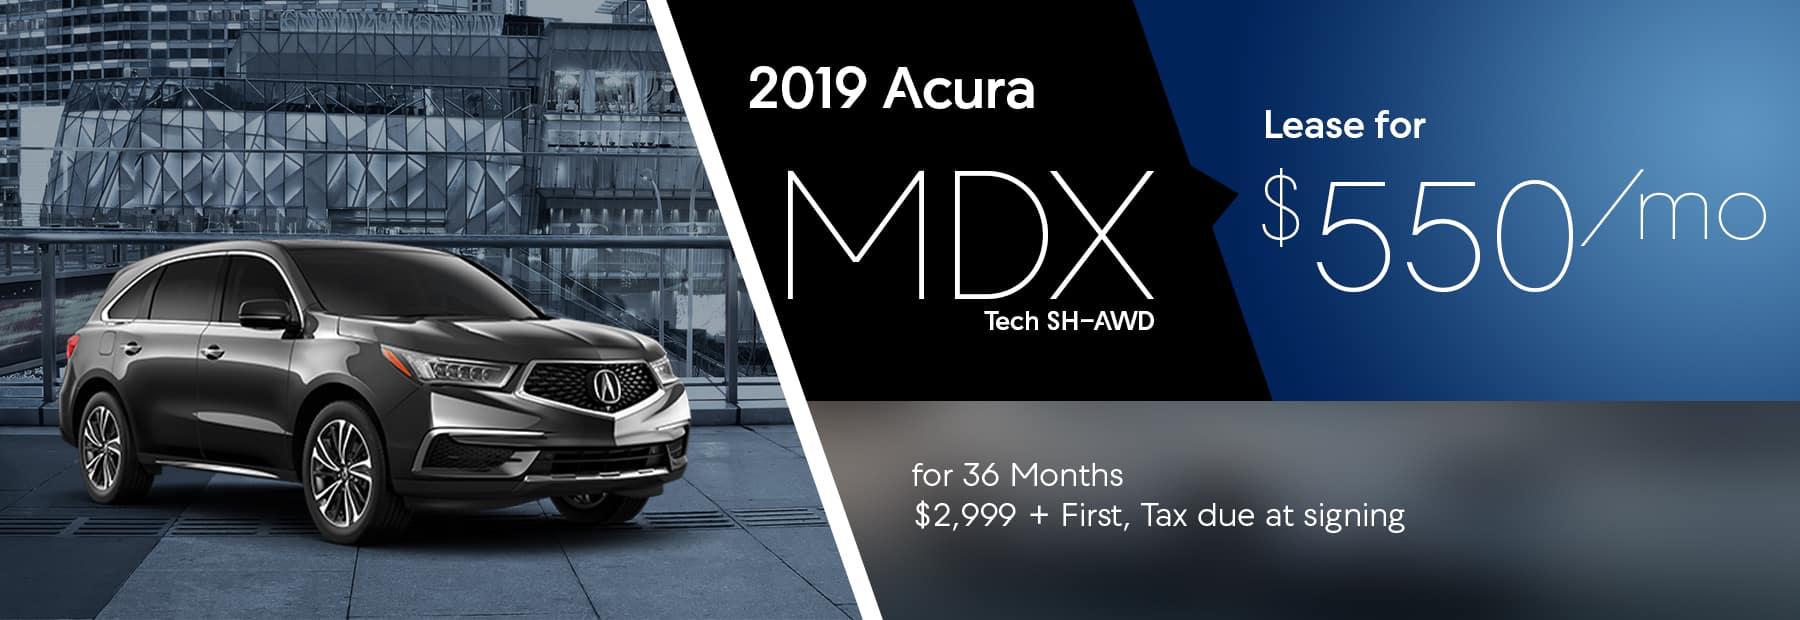 Acura Dealership Denver >> Fisher Acura New Used Cars Acura Dealership Near Denver Co